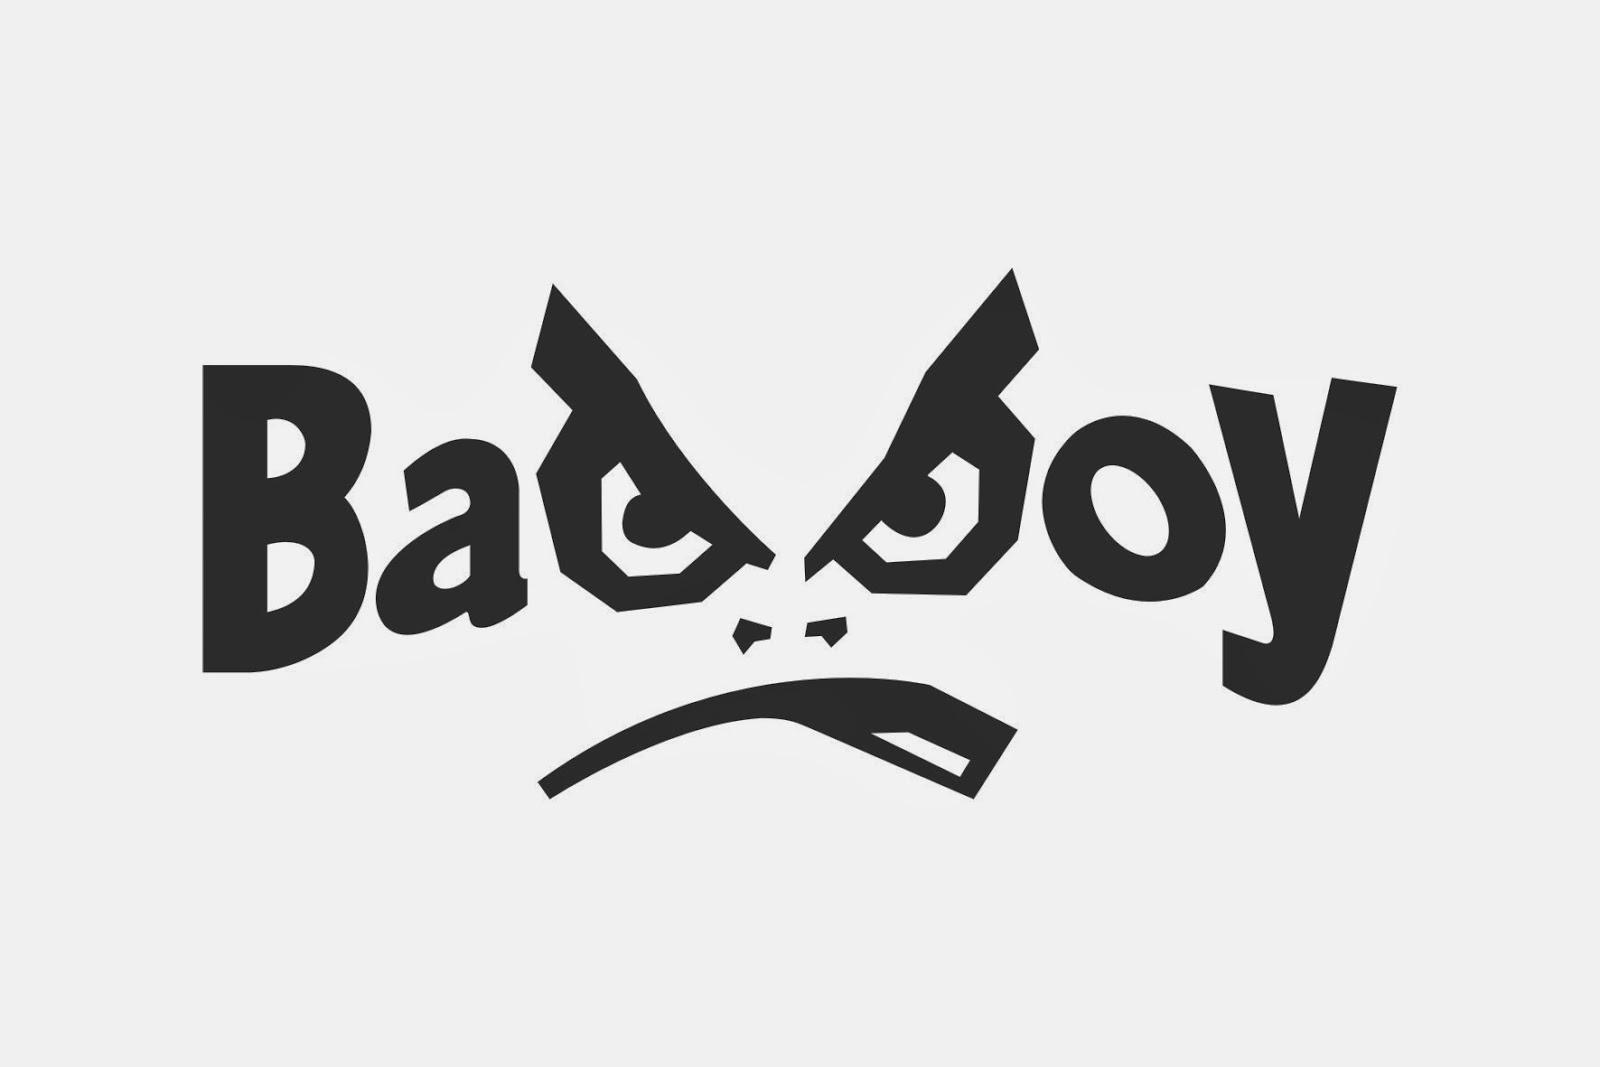 Bad Boy Logos